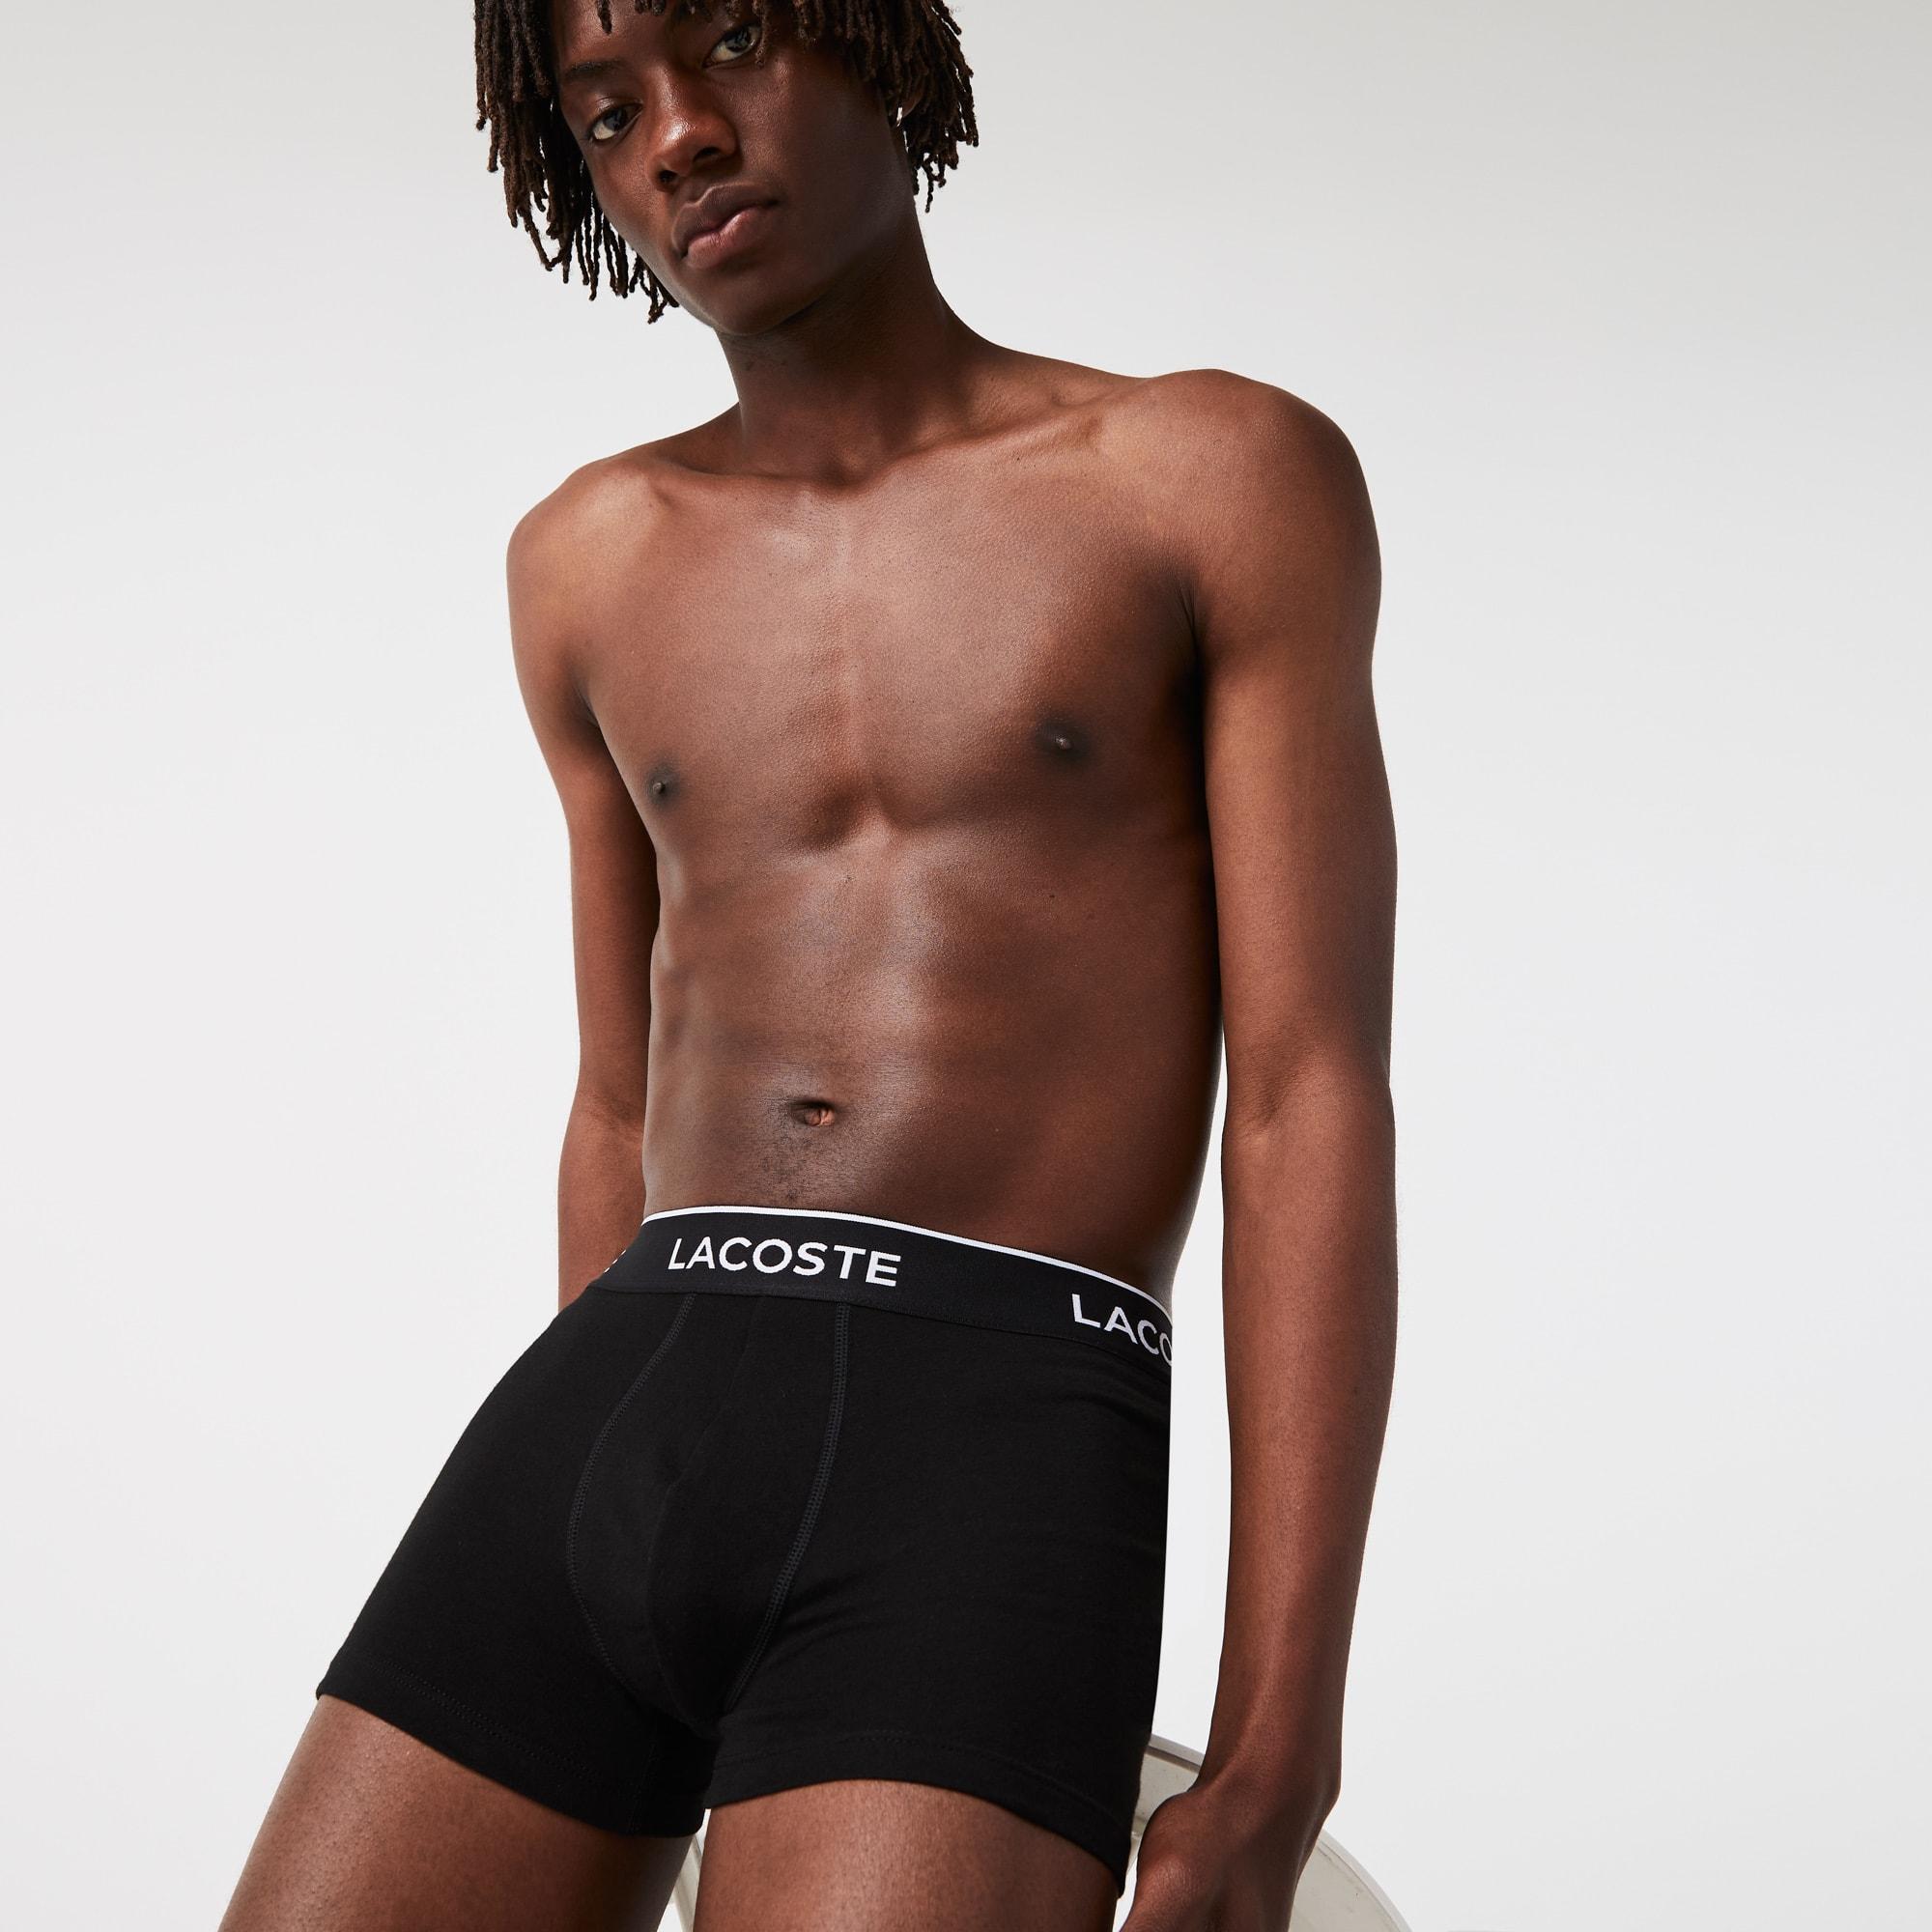 Lacoste 3-Pack Casual Cotton Stretch Men/'s Boxer Trunks Black